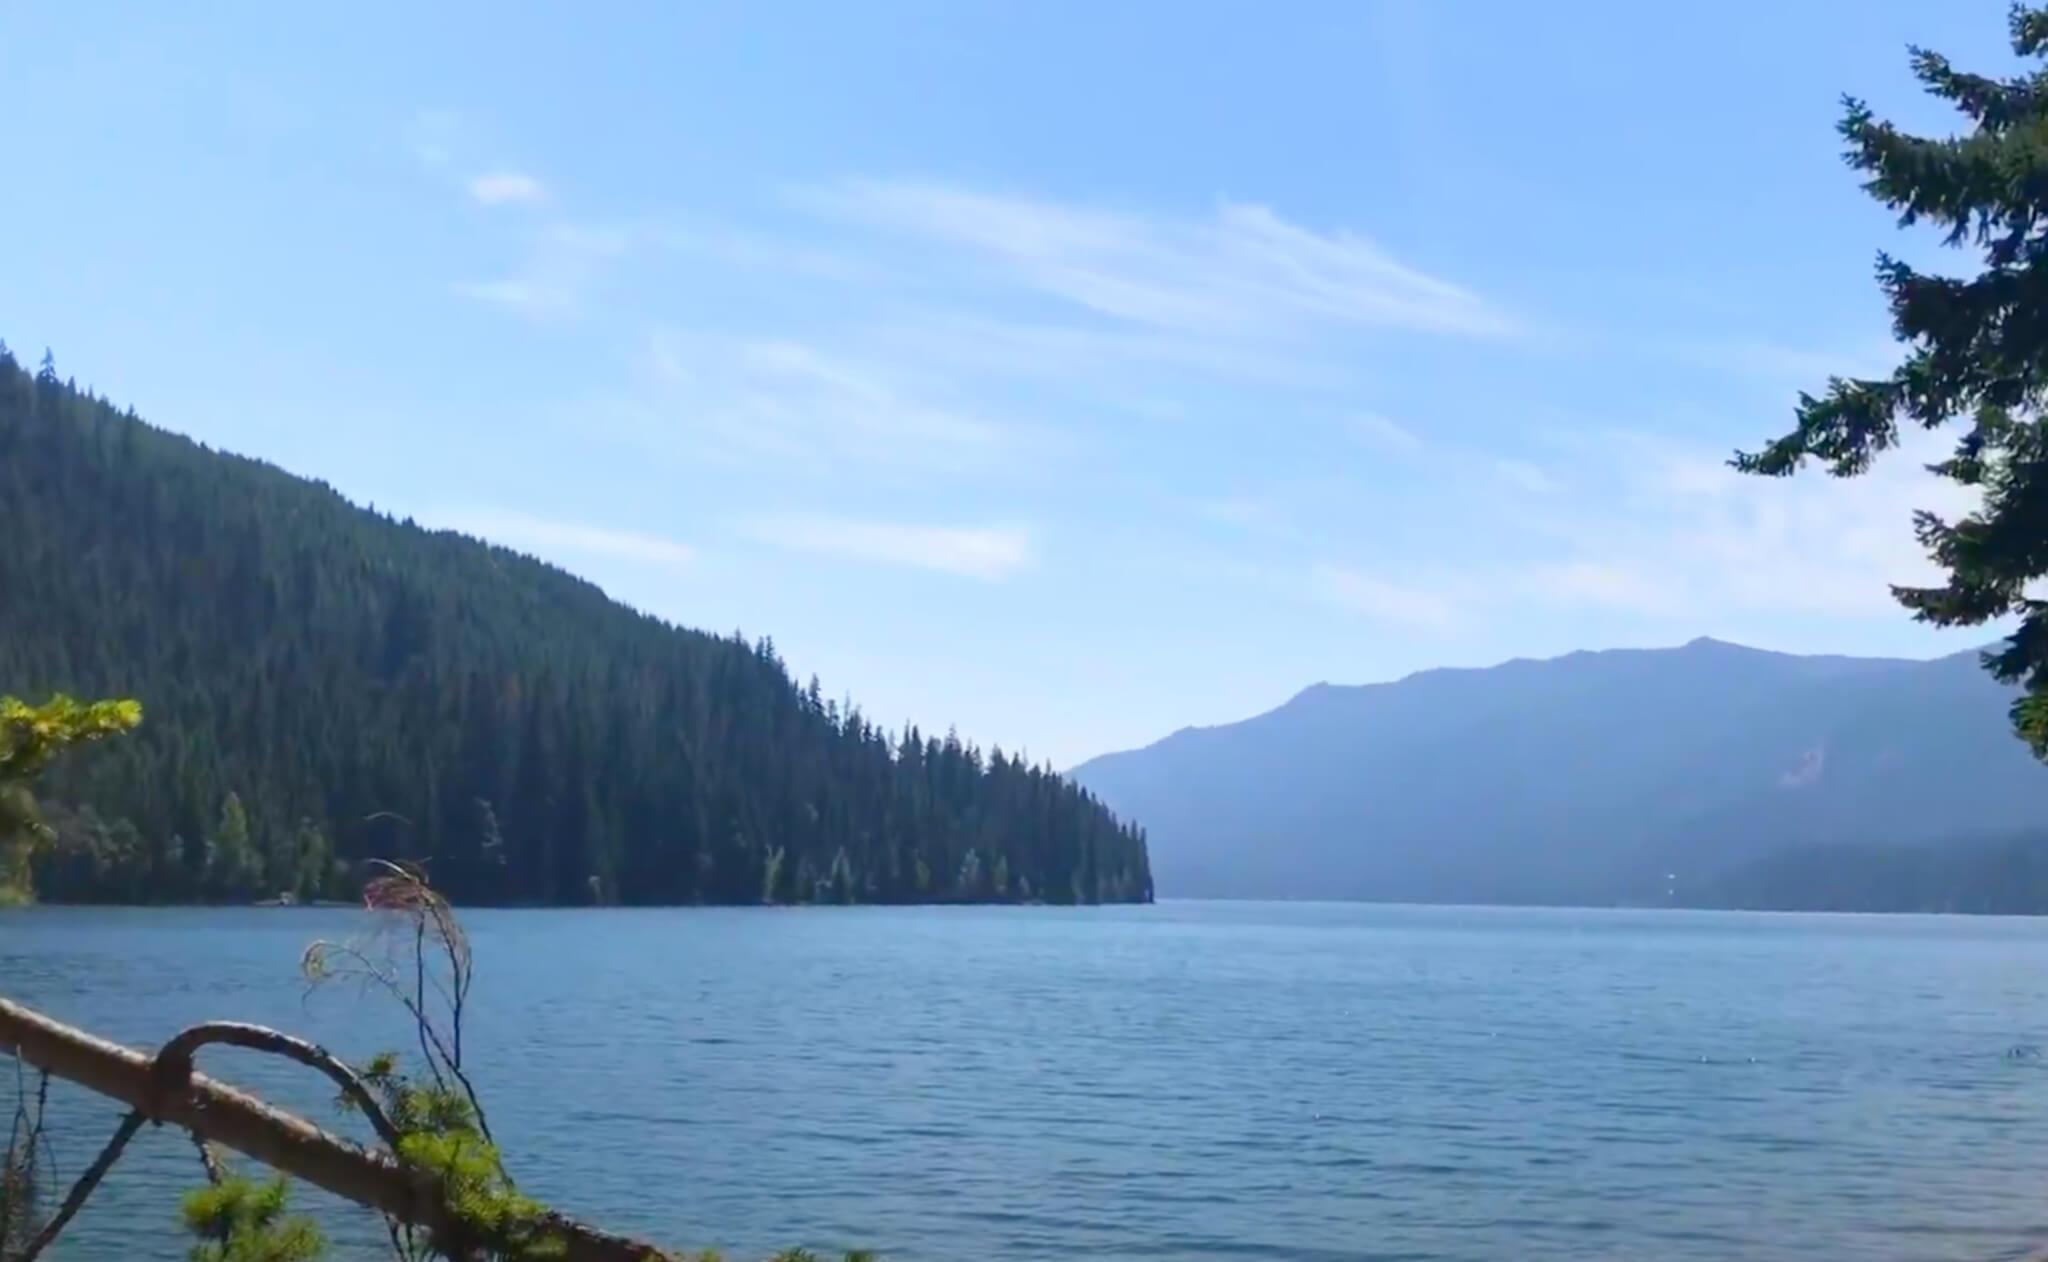 Kachess-Lake-Fishing-Report-Guide-Washington-WA-06